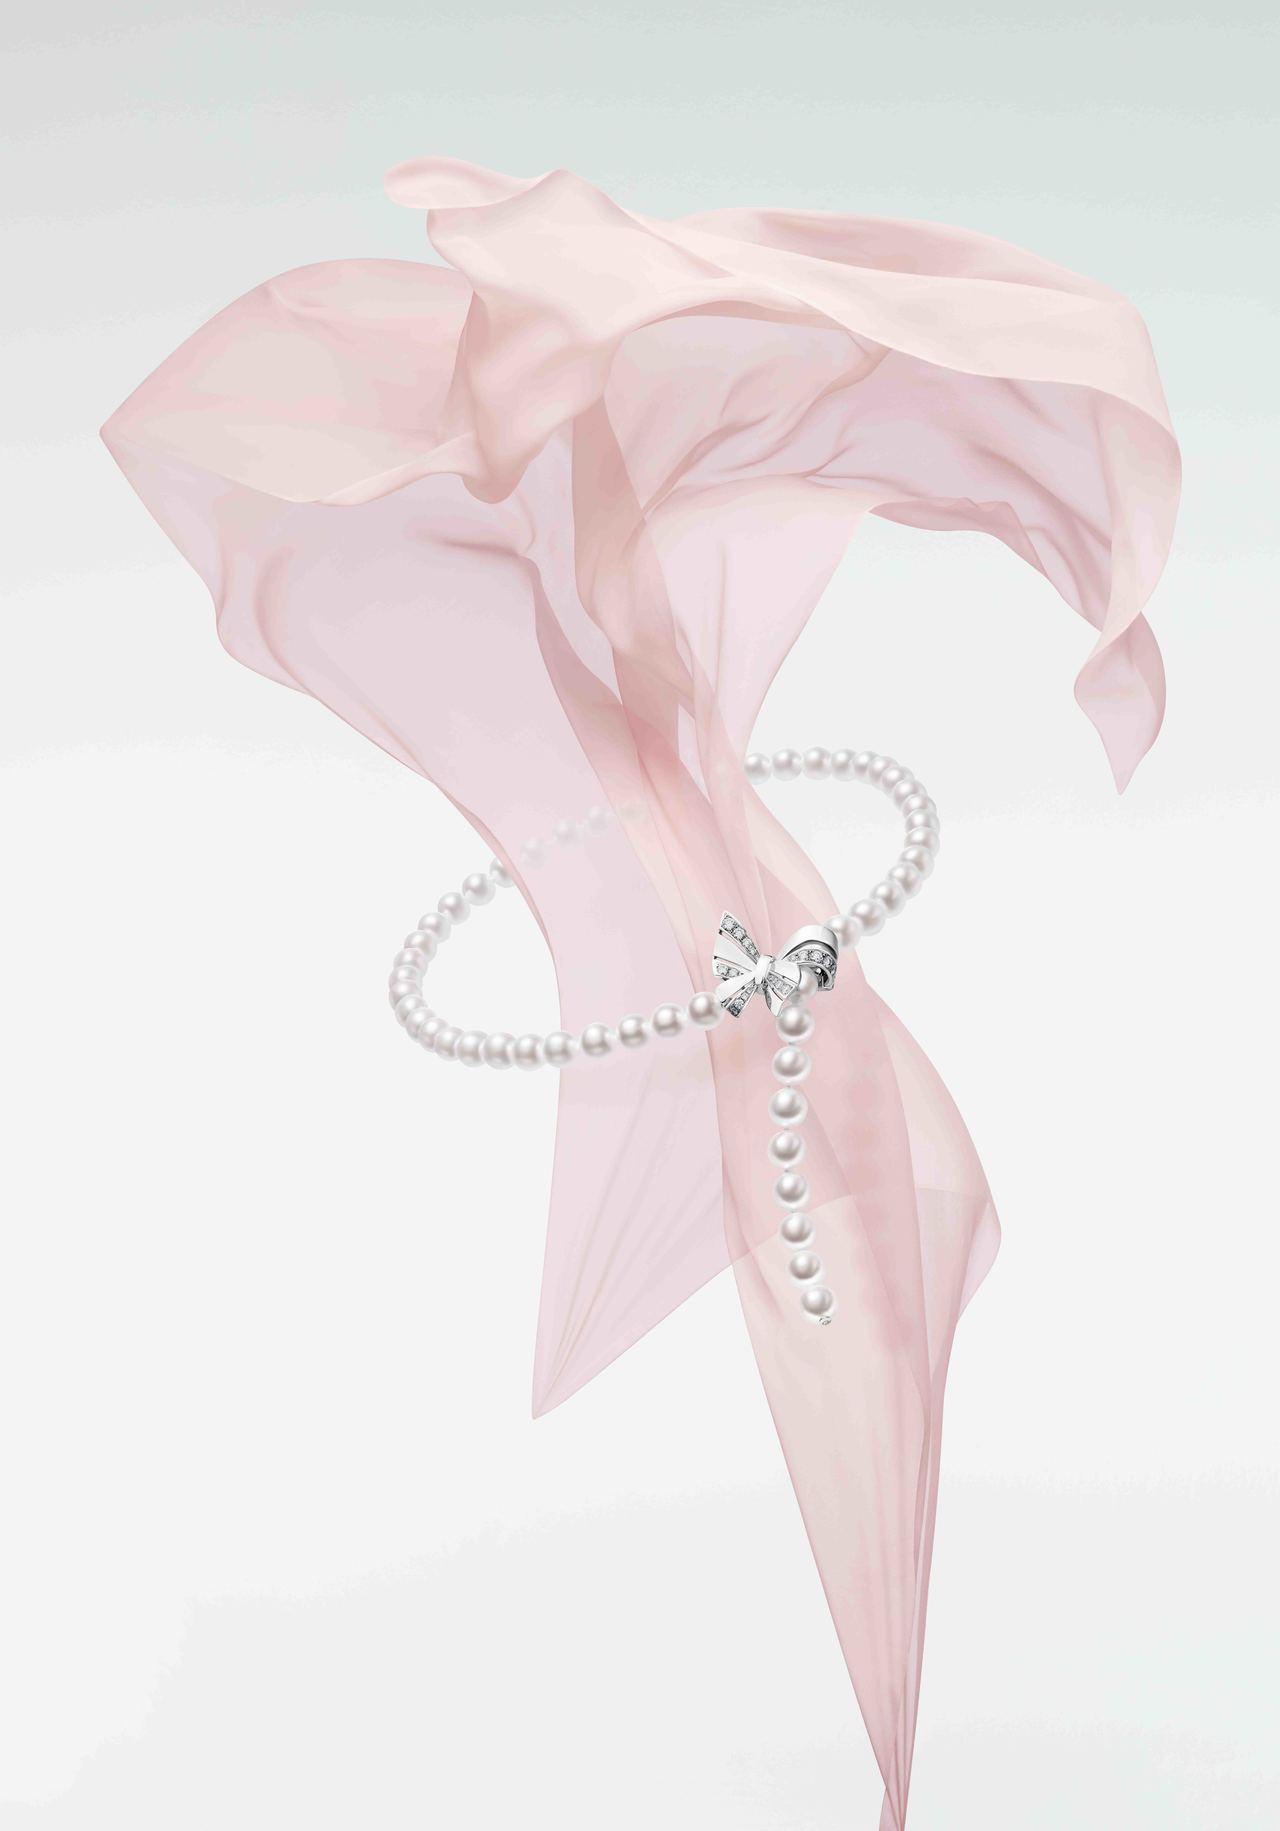 Jeux de Rubans系列珠寶以珍珠鑽石呈現出緞帶娉婷縈繞的模樣。圖/MI...